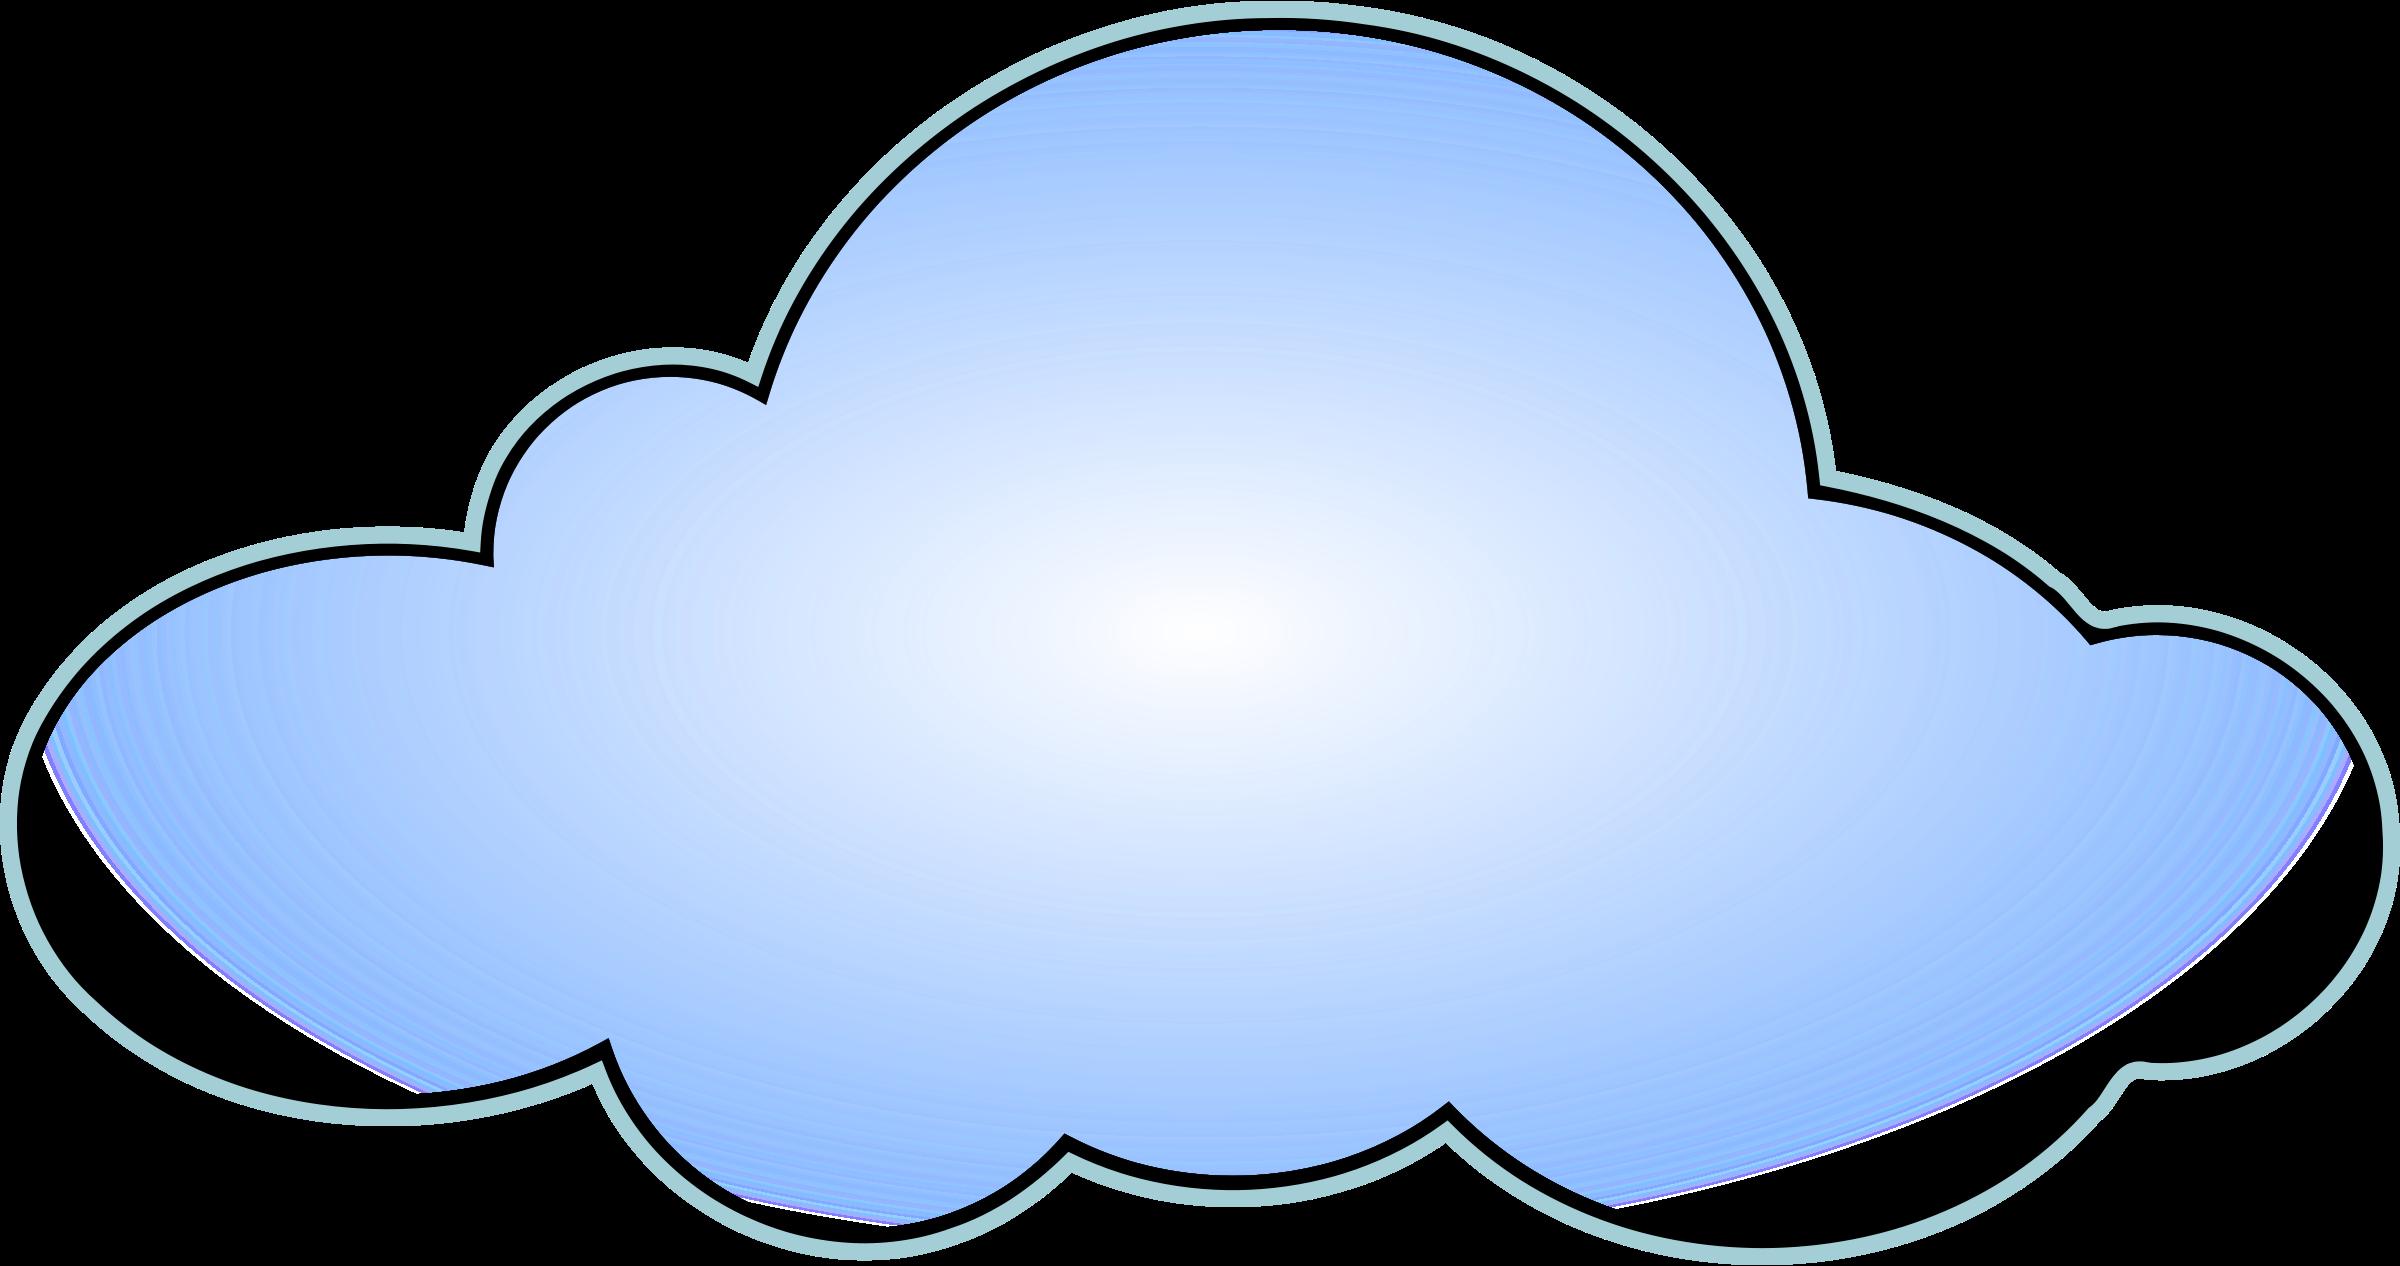 Cloud cliparts free clipart images